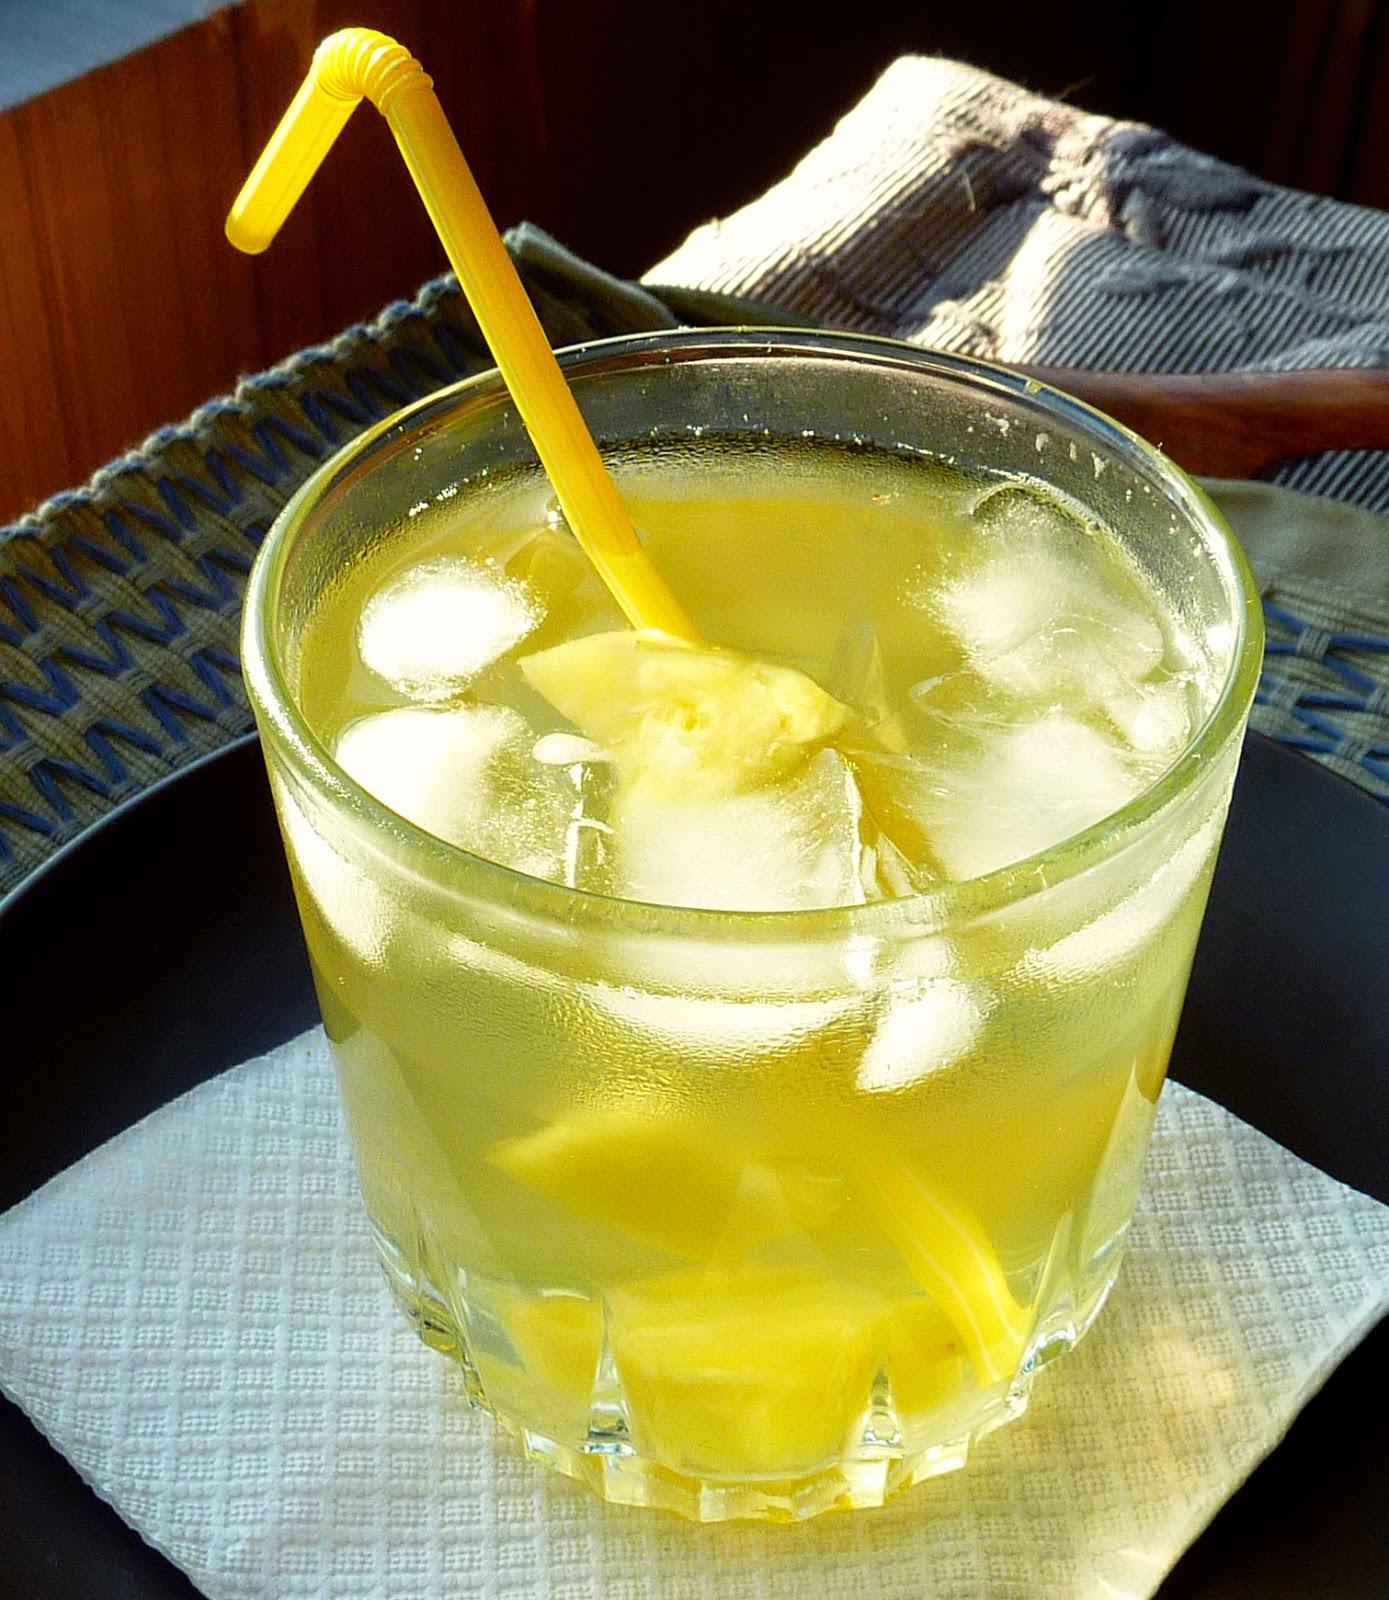 Receta fácil: Cómo hacer agua de Piña (Ananá)